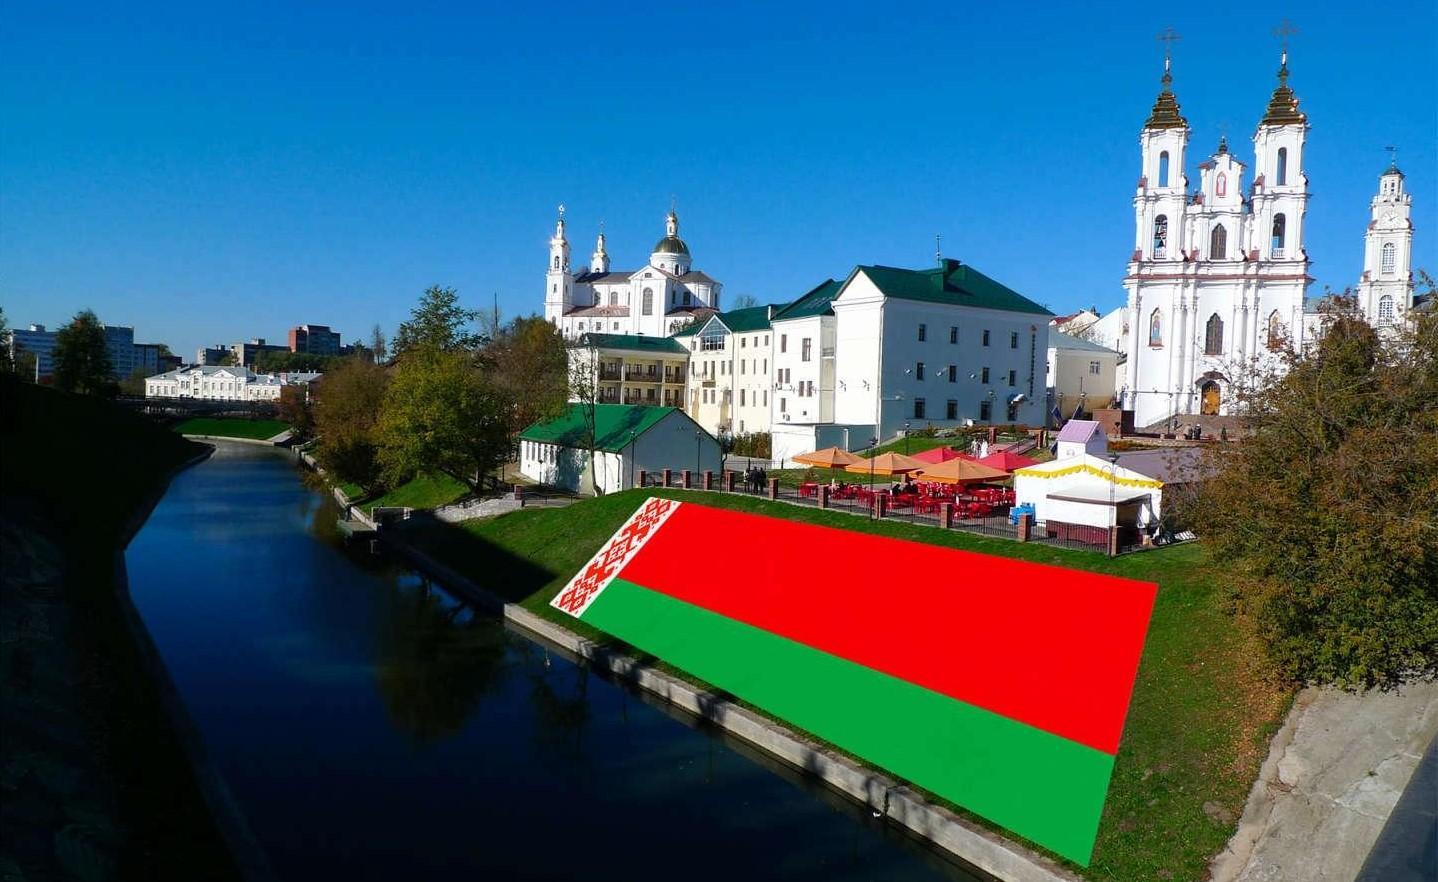 Оптом в Беларуси, оптом Беларусь, оптом в РБ